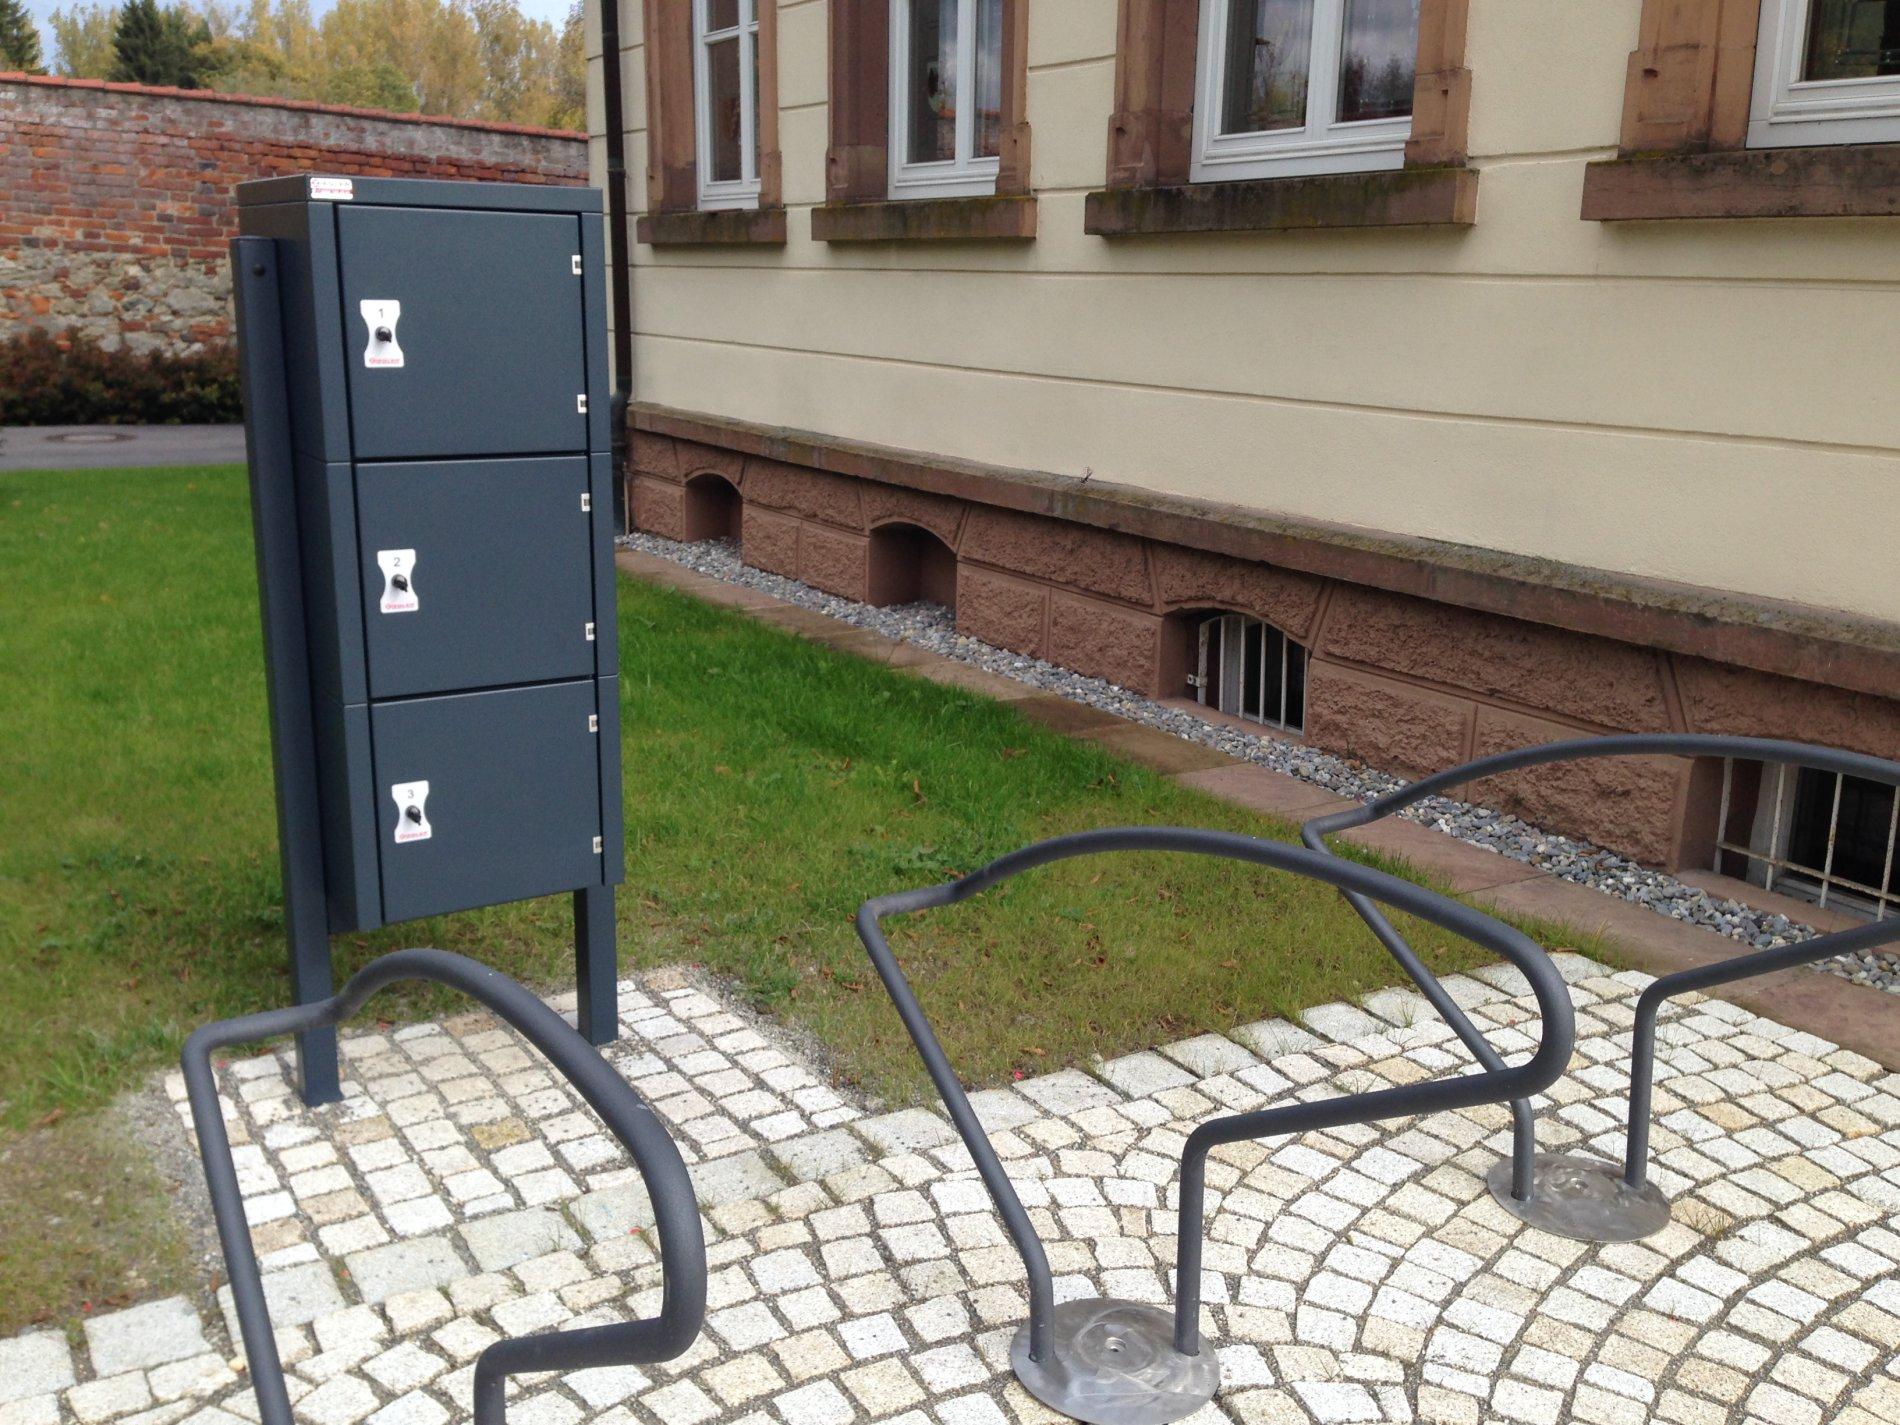 E-Bike Akku-Ladeboxen vor dem Rathaus